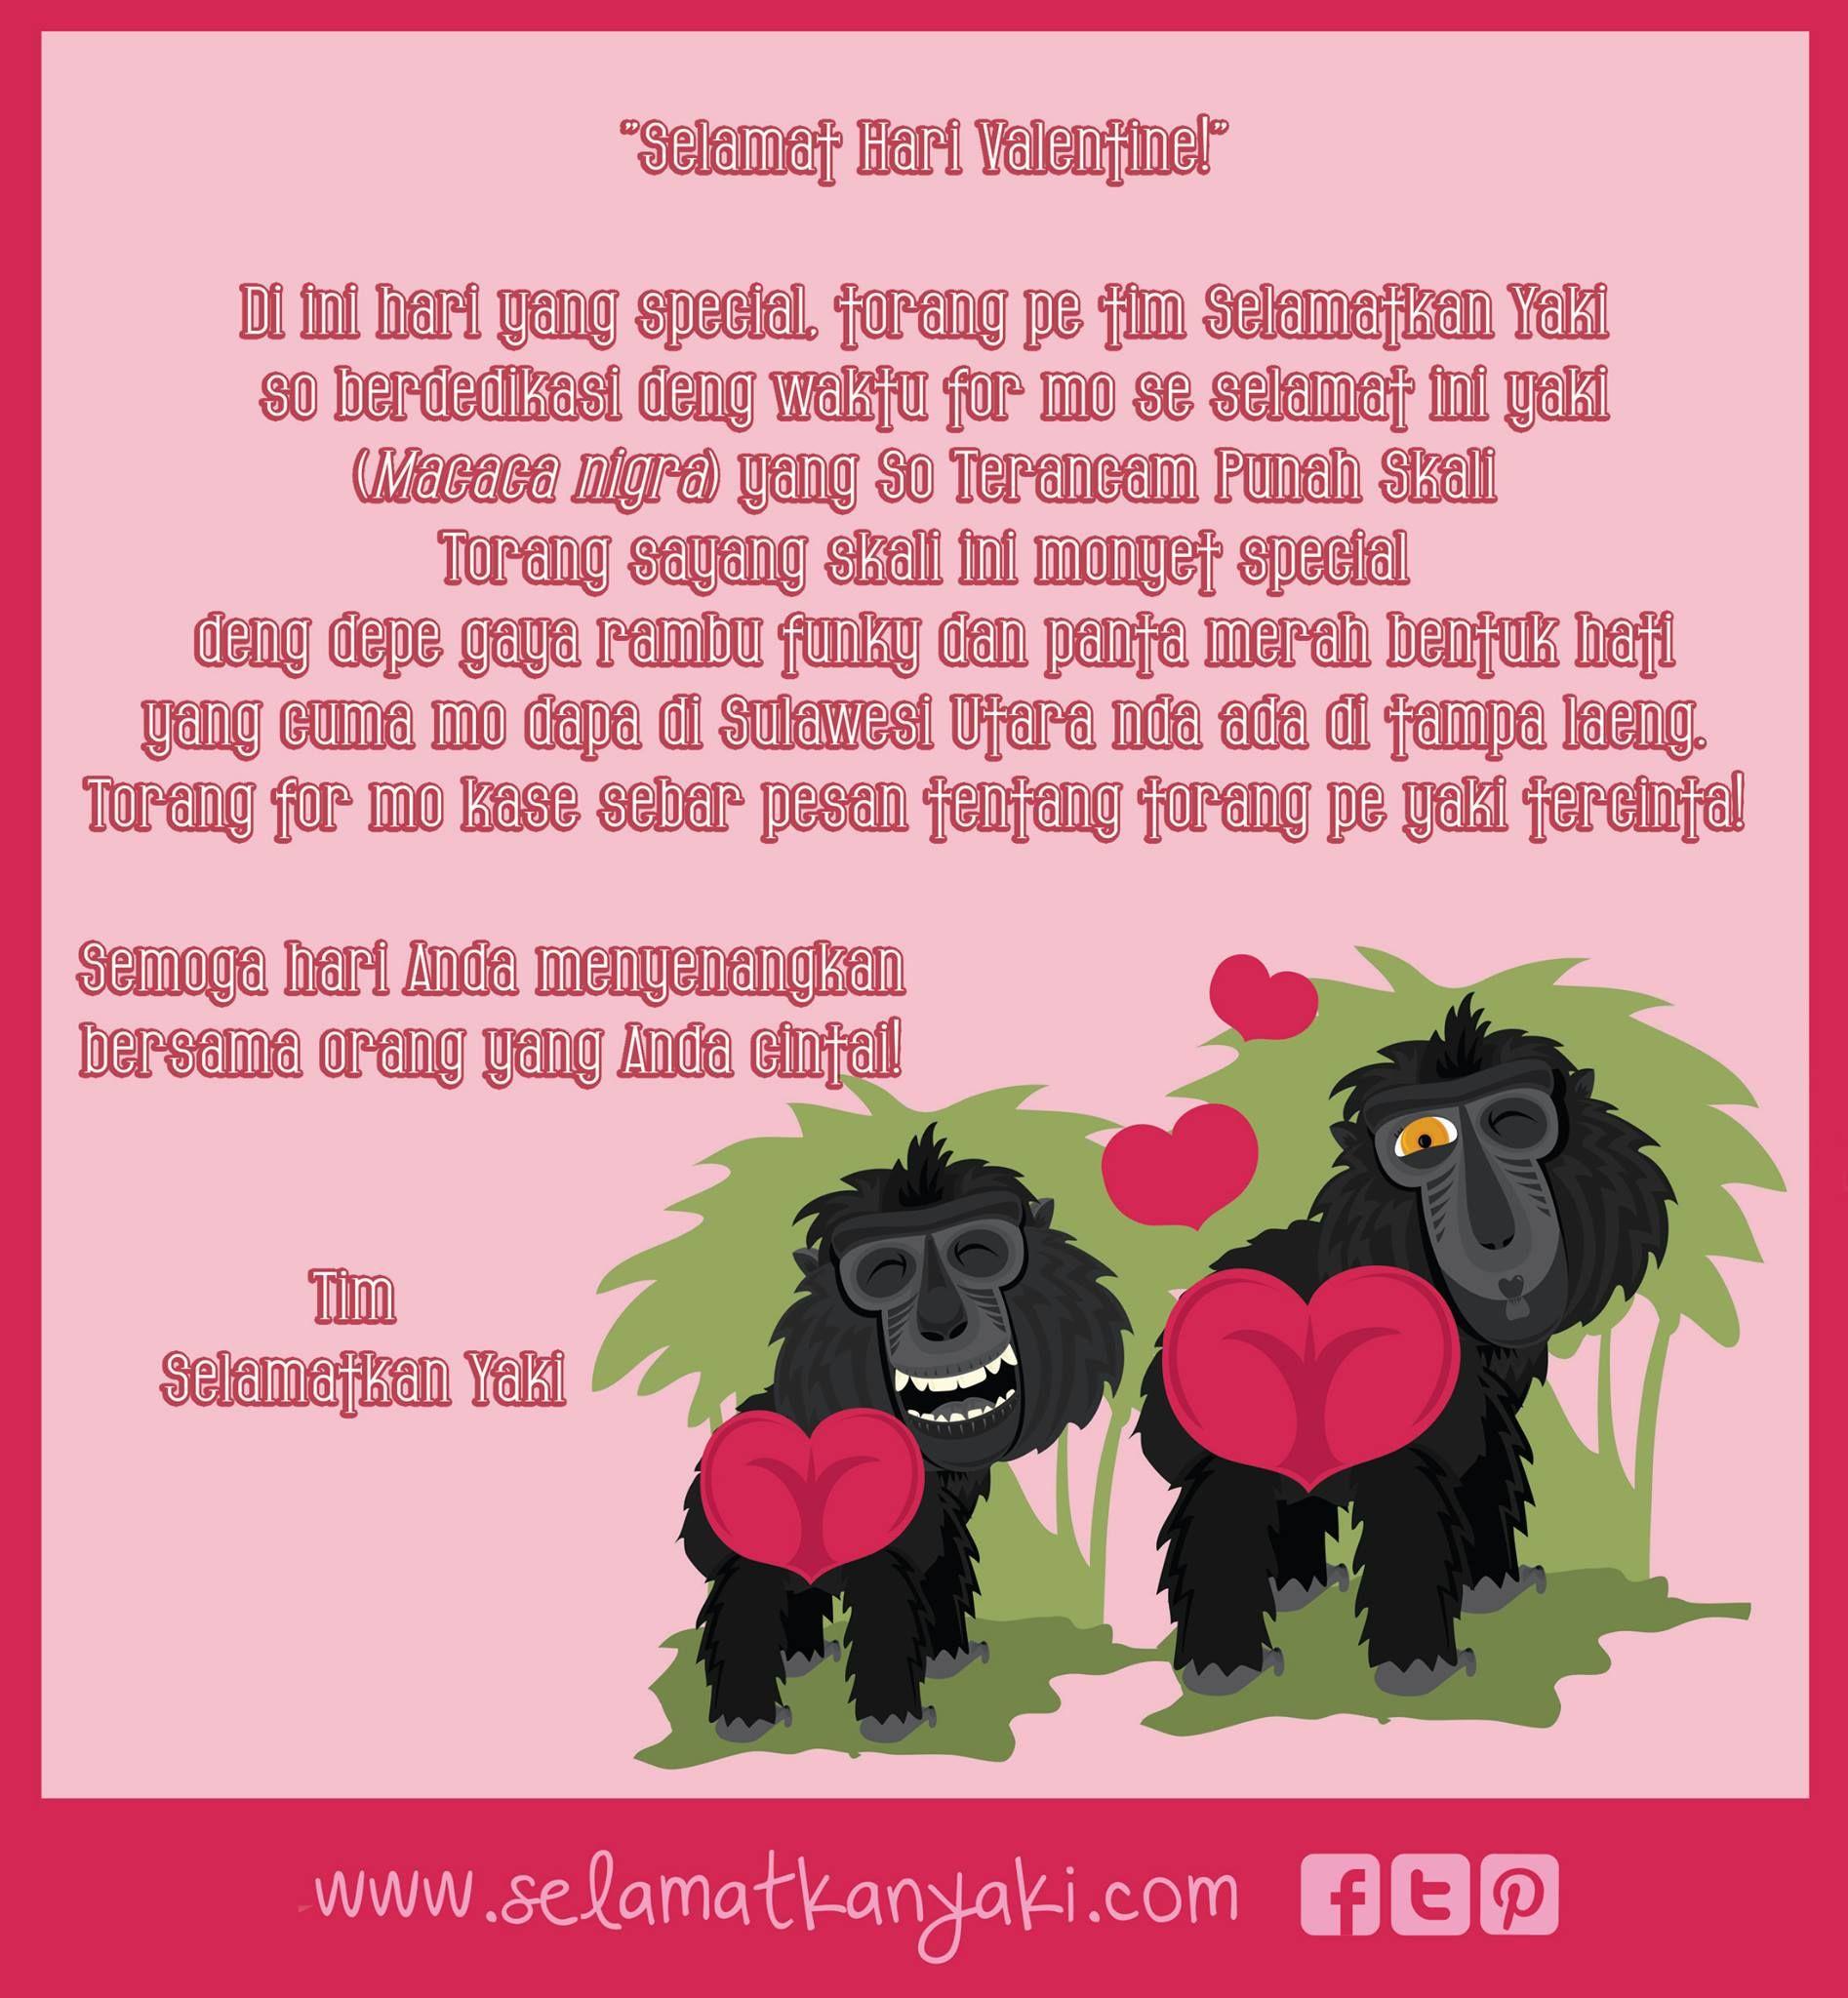 Happy Valentine S Day From Our Selamatkan Yaki Team Bentuk